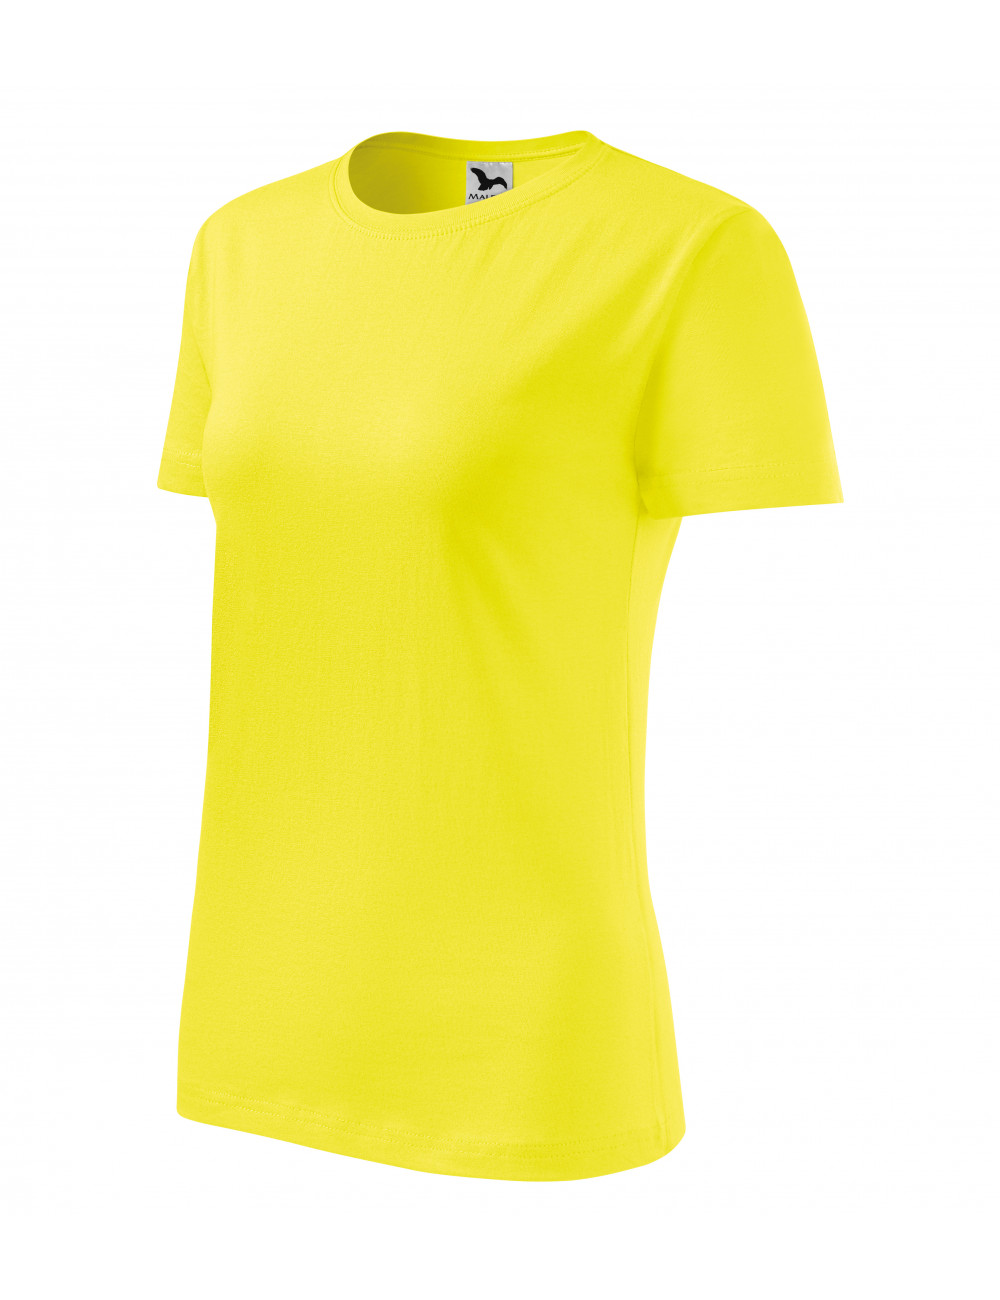 Adler MALFINI Koszulka damska Classic New 133 cytrynowy